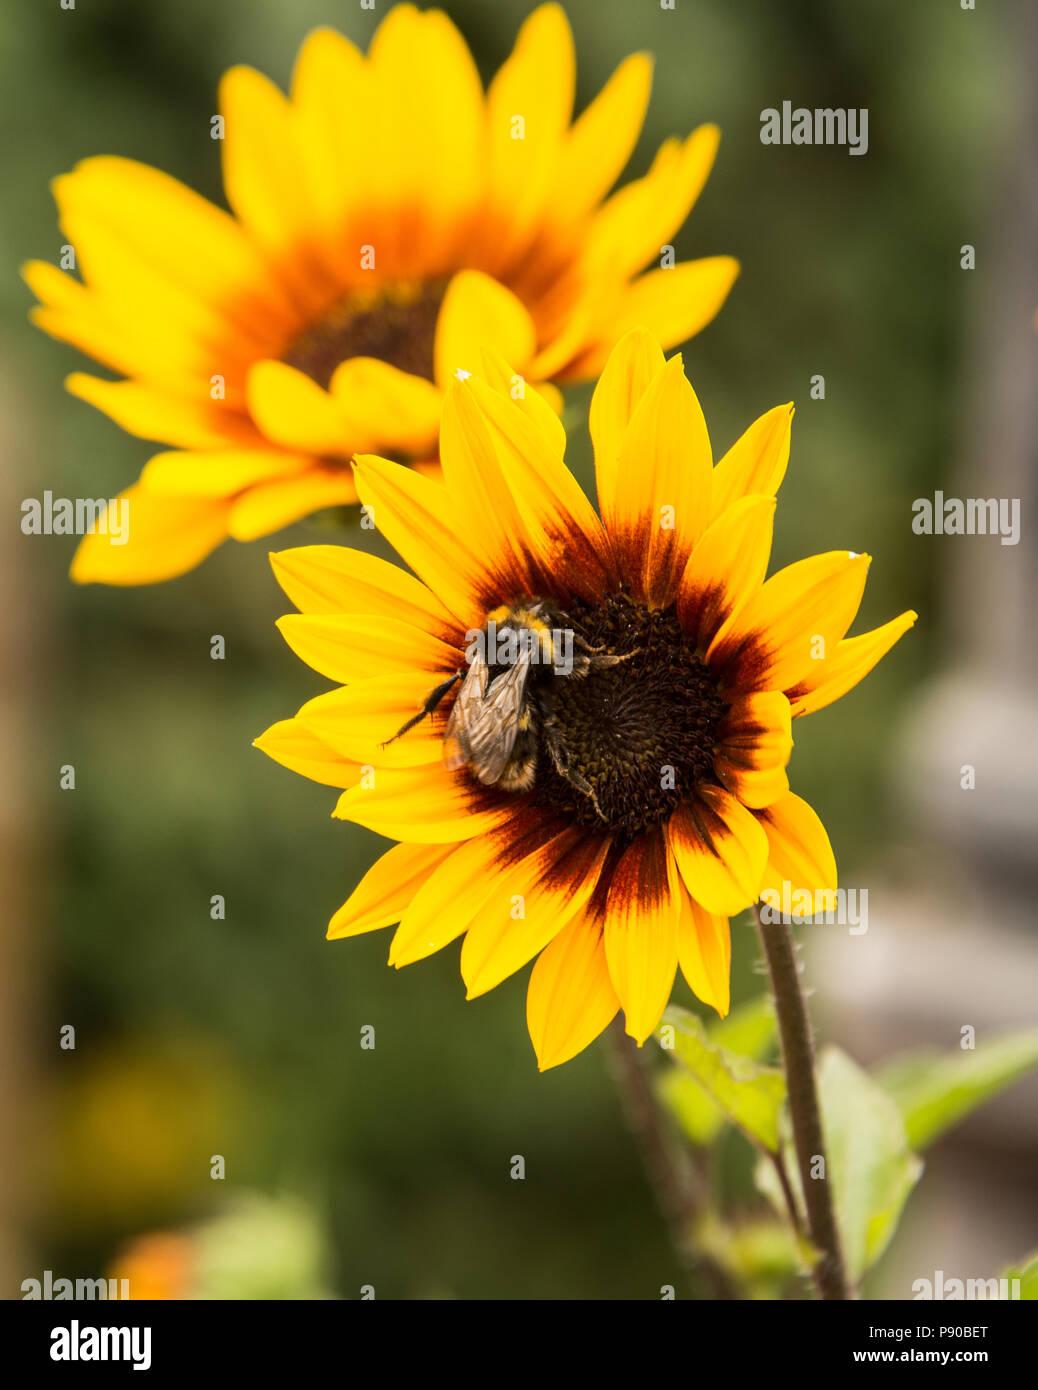 Biene auf Blume Sonnenblume. Stockbild